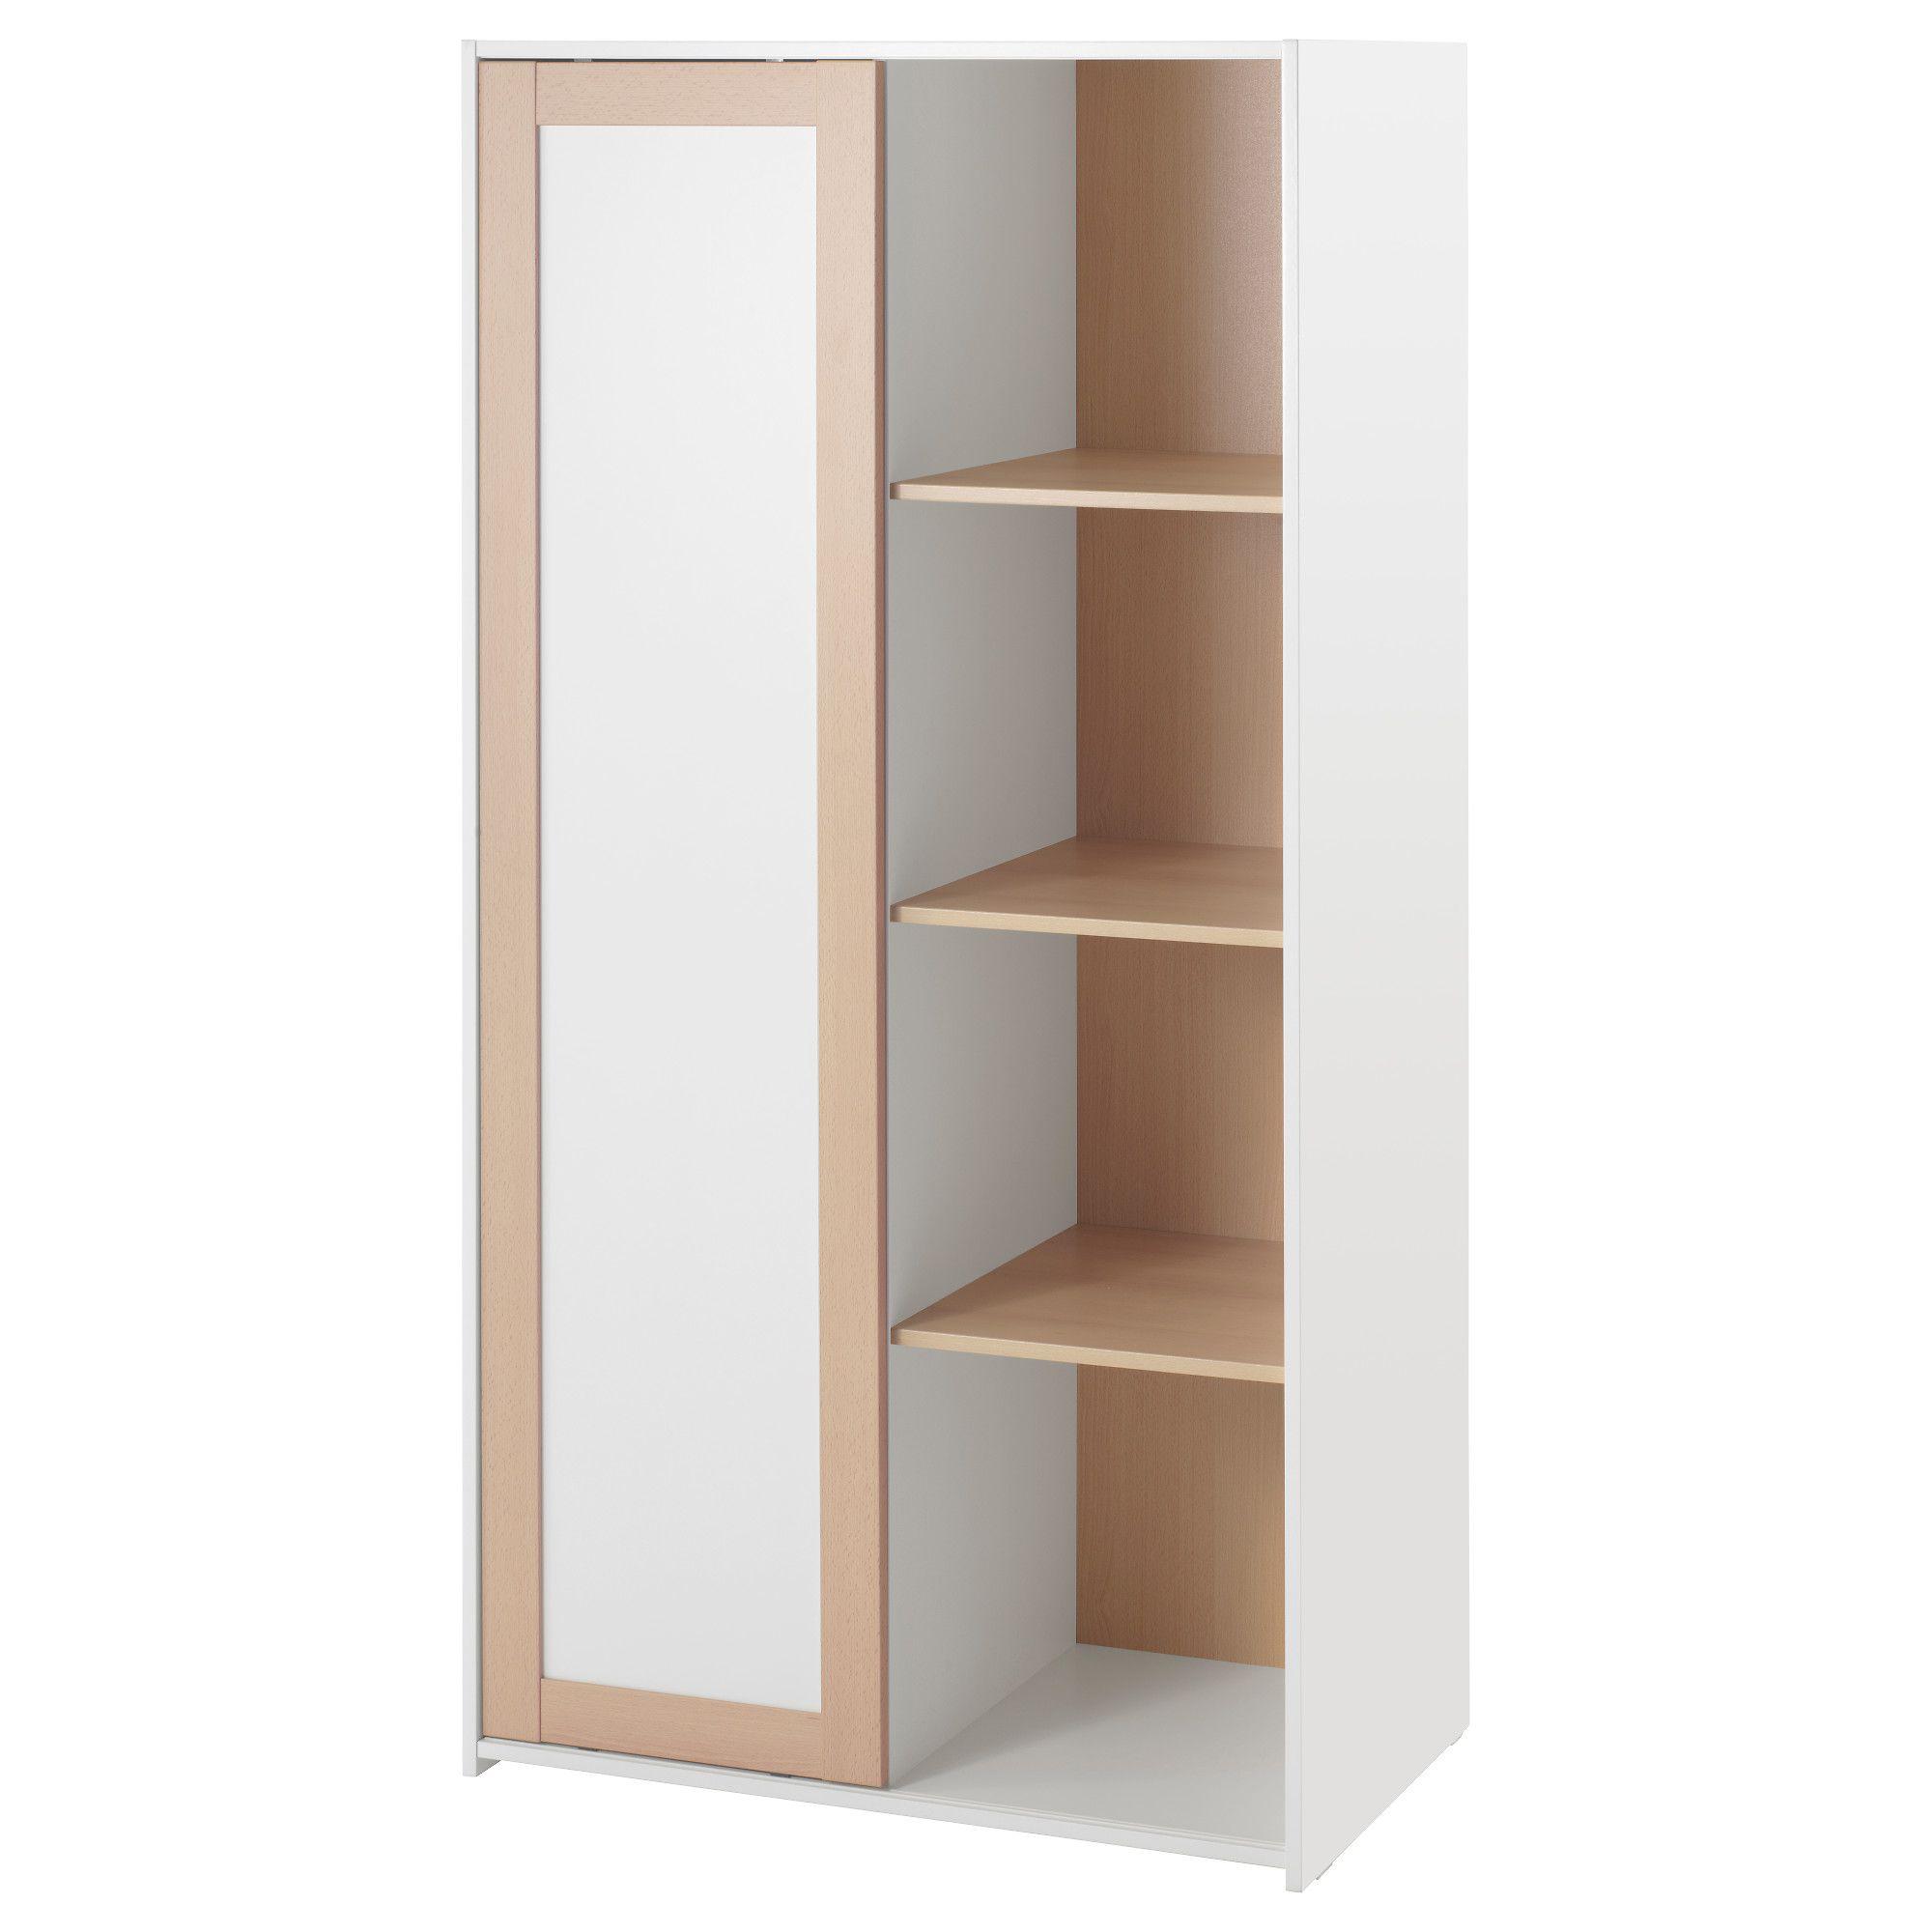 Ikea Schrank Aneboda | tomish.net